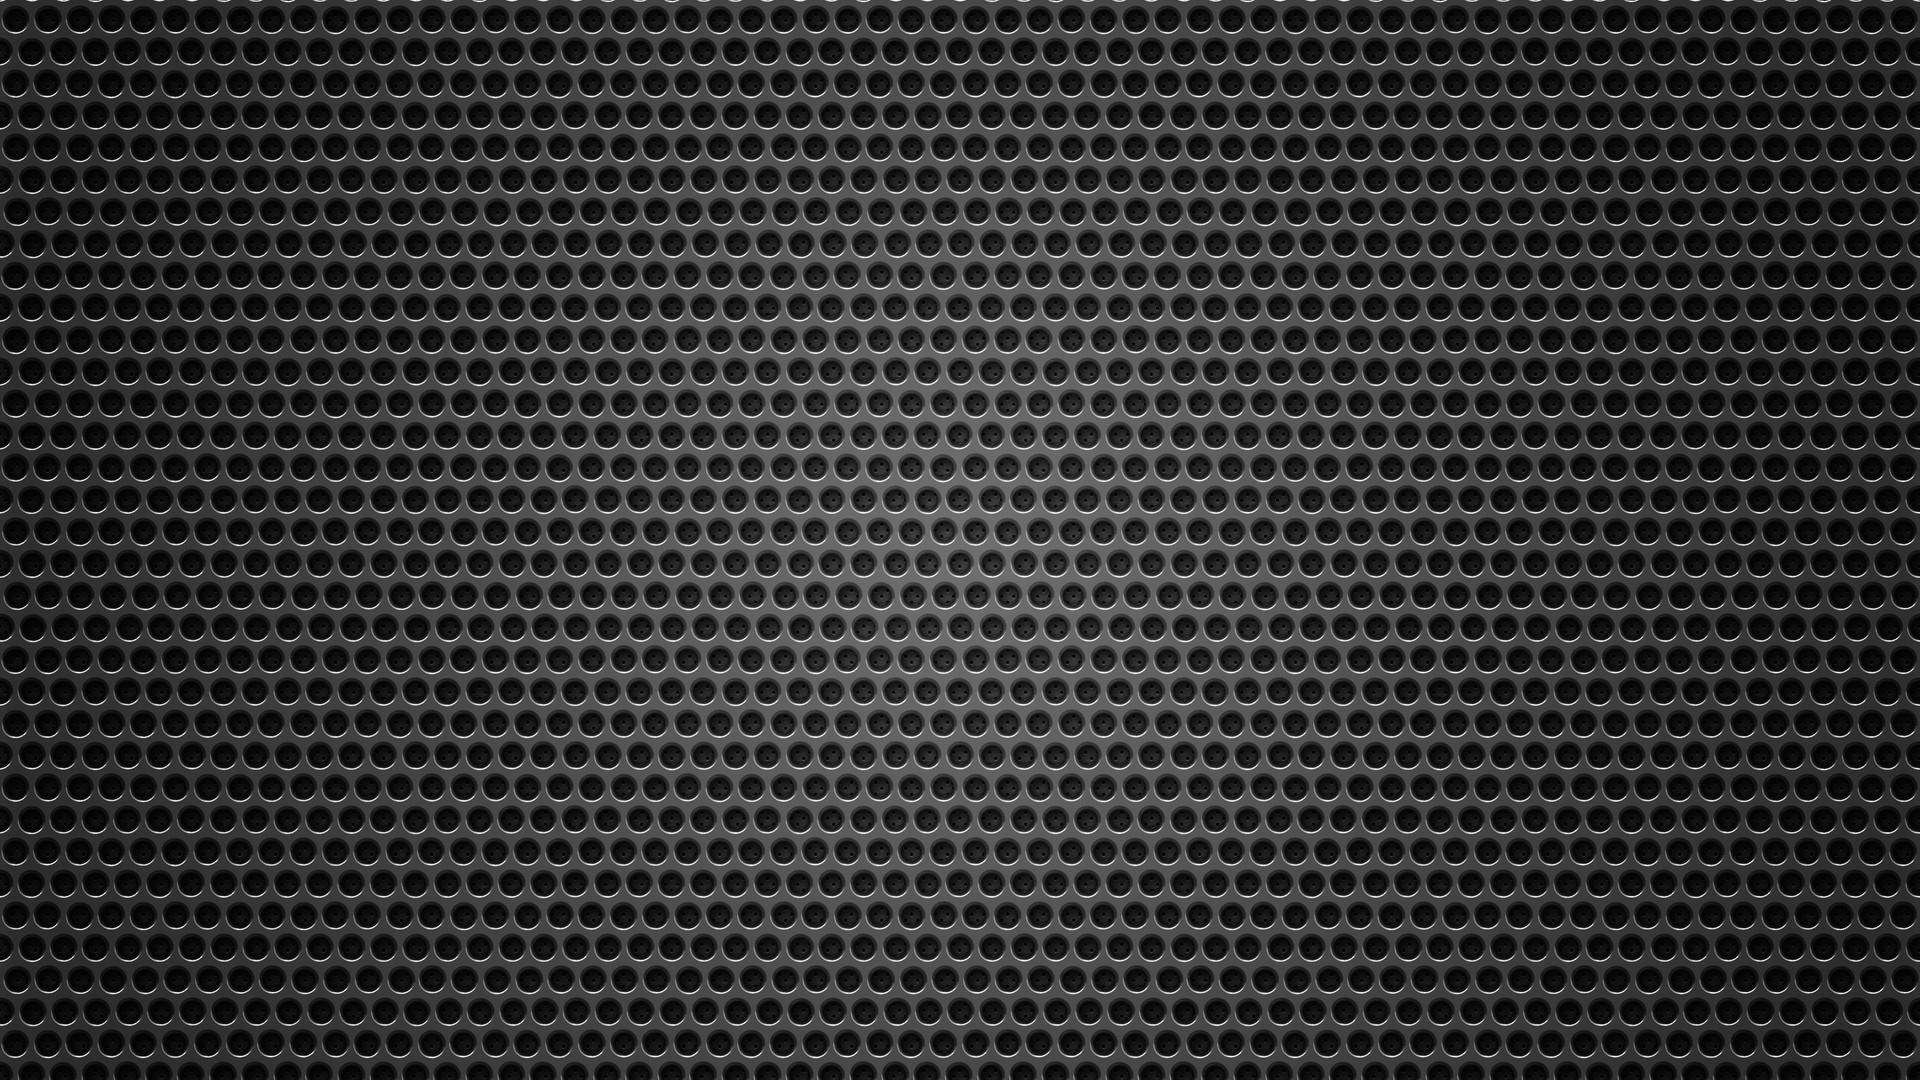 Wallpaper Dark Pattern Metal Texture Circle Grid